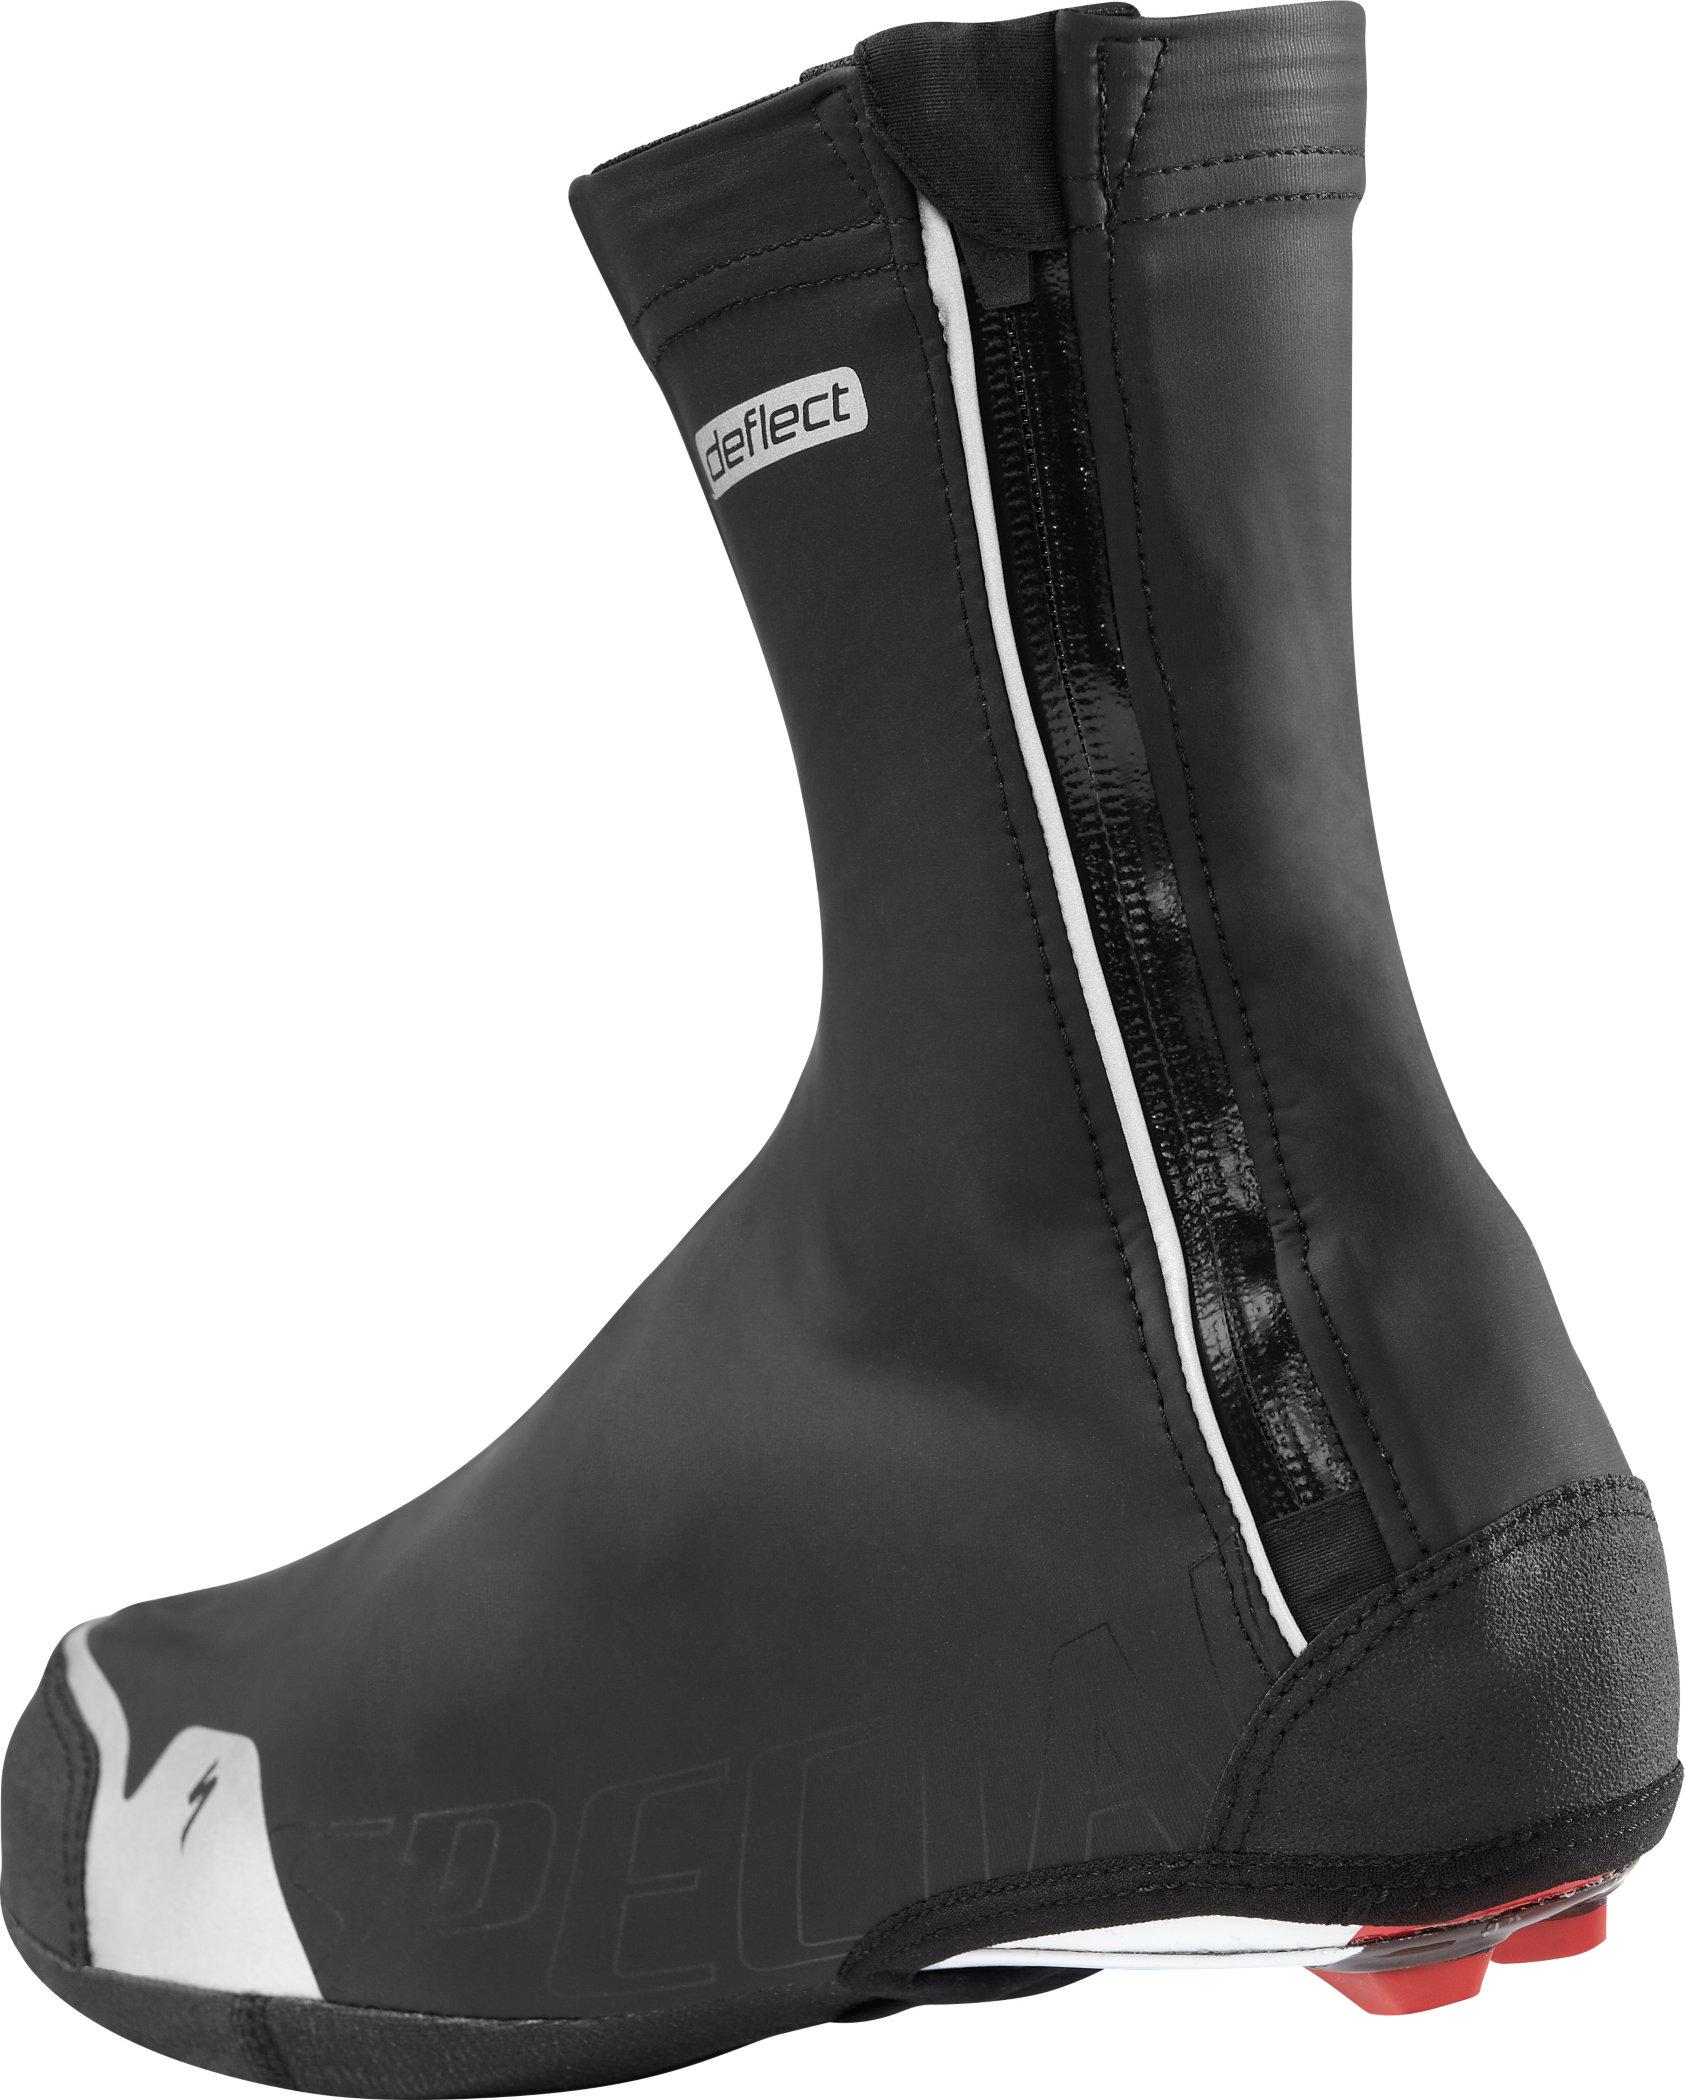 Specialized Deflect Comp Shoe Covers Black (M) 41-42 - Alpha Bikes